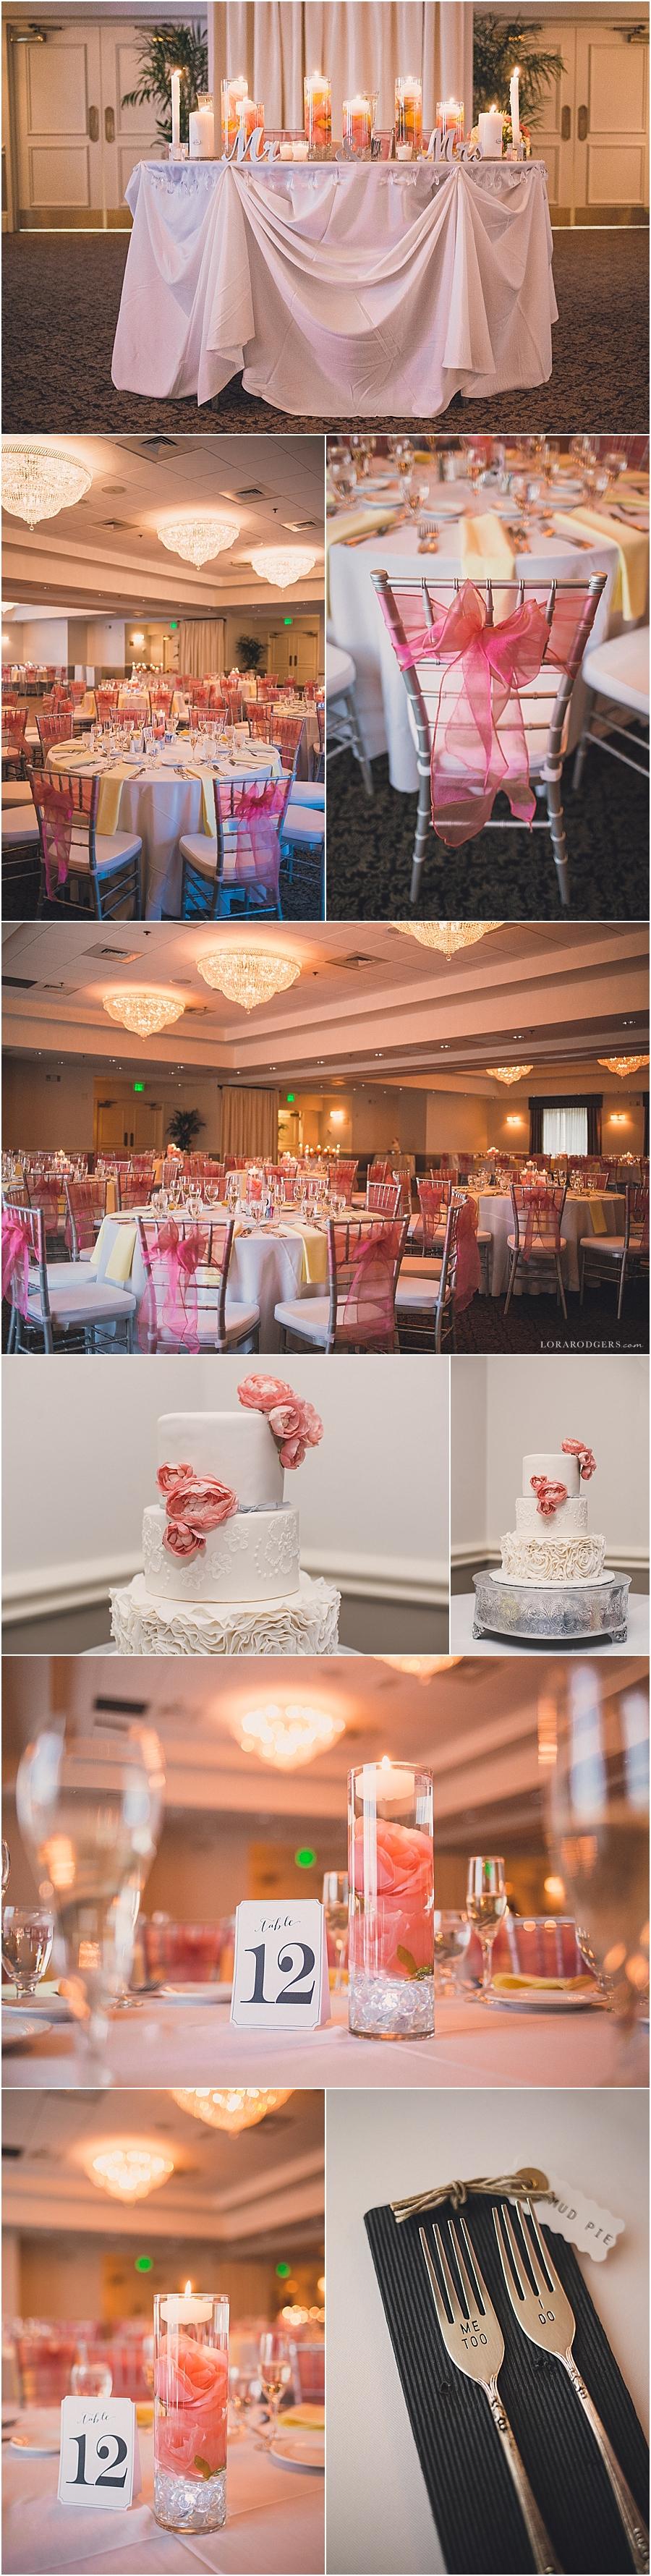 Heathrow_Country_Club_Lake_Mary_Florida_Wedding_010